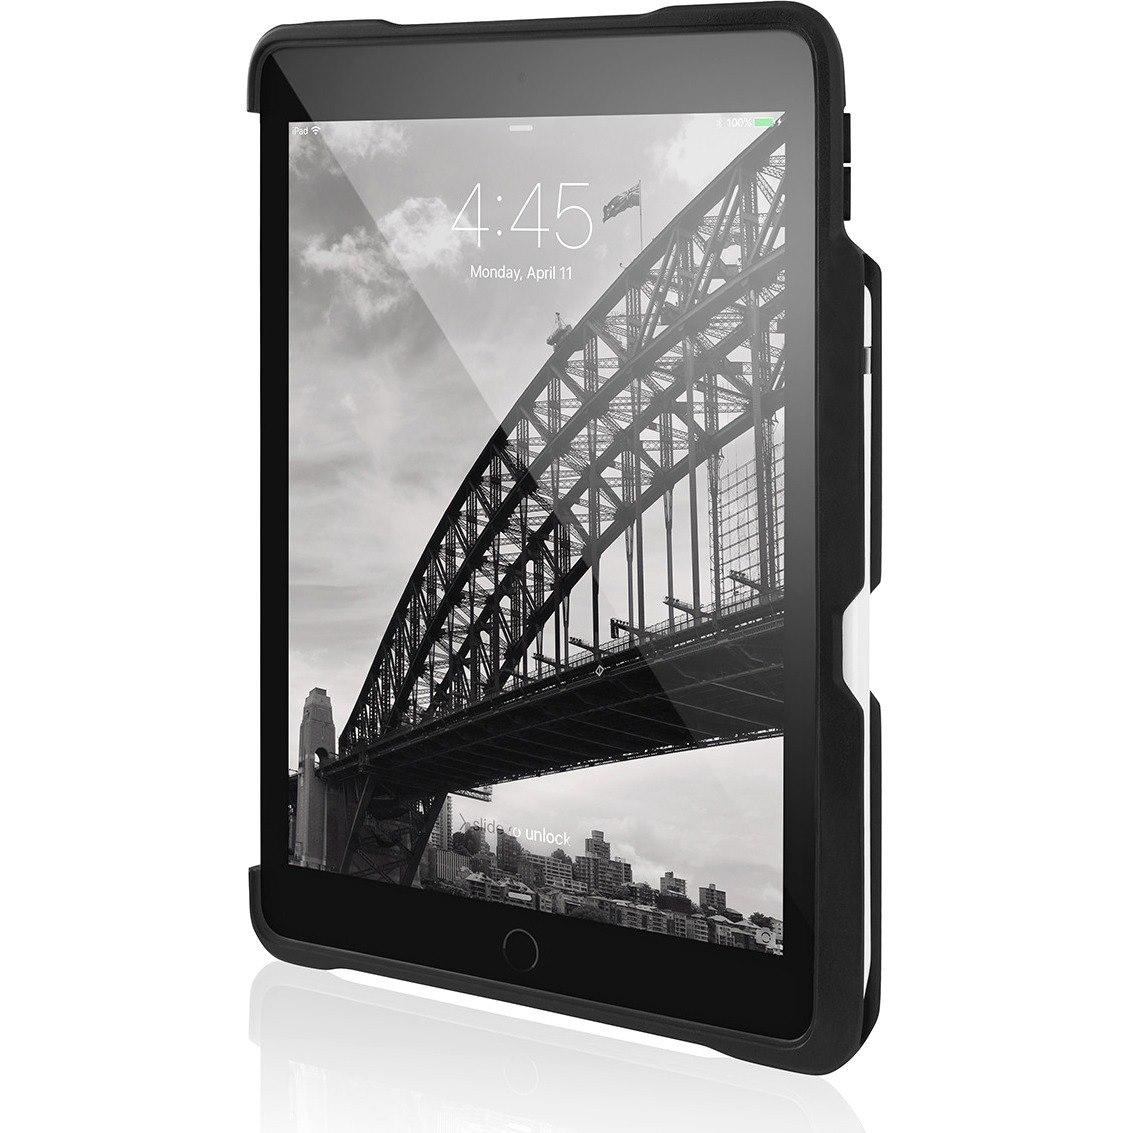 STM Goods Dux Case for Apple iPad Pro, iPad Pro (2017) Tablet - Translucent, Black